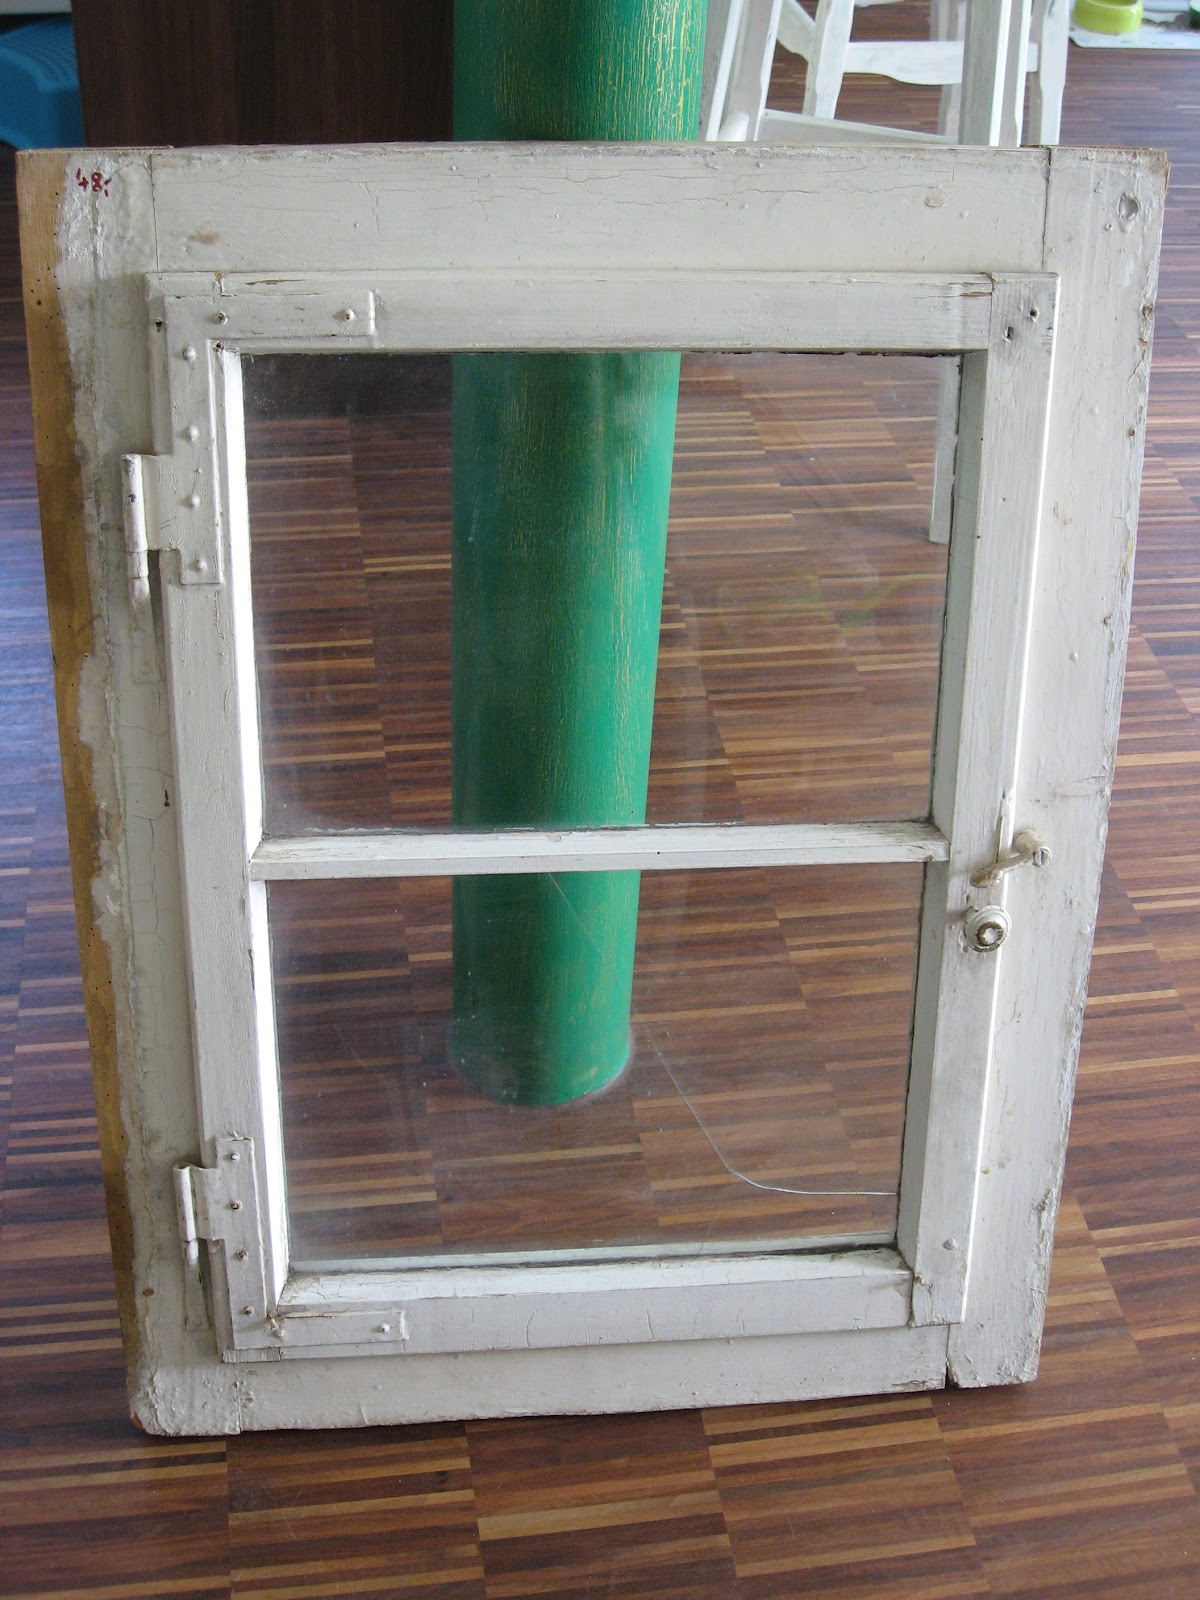 Häufig ArtworX: Das Fenster zum Flur. AZ82